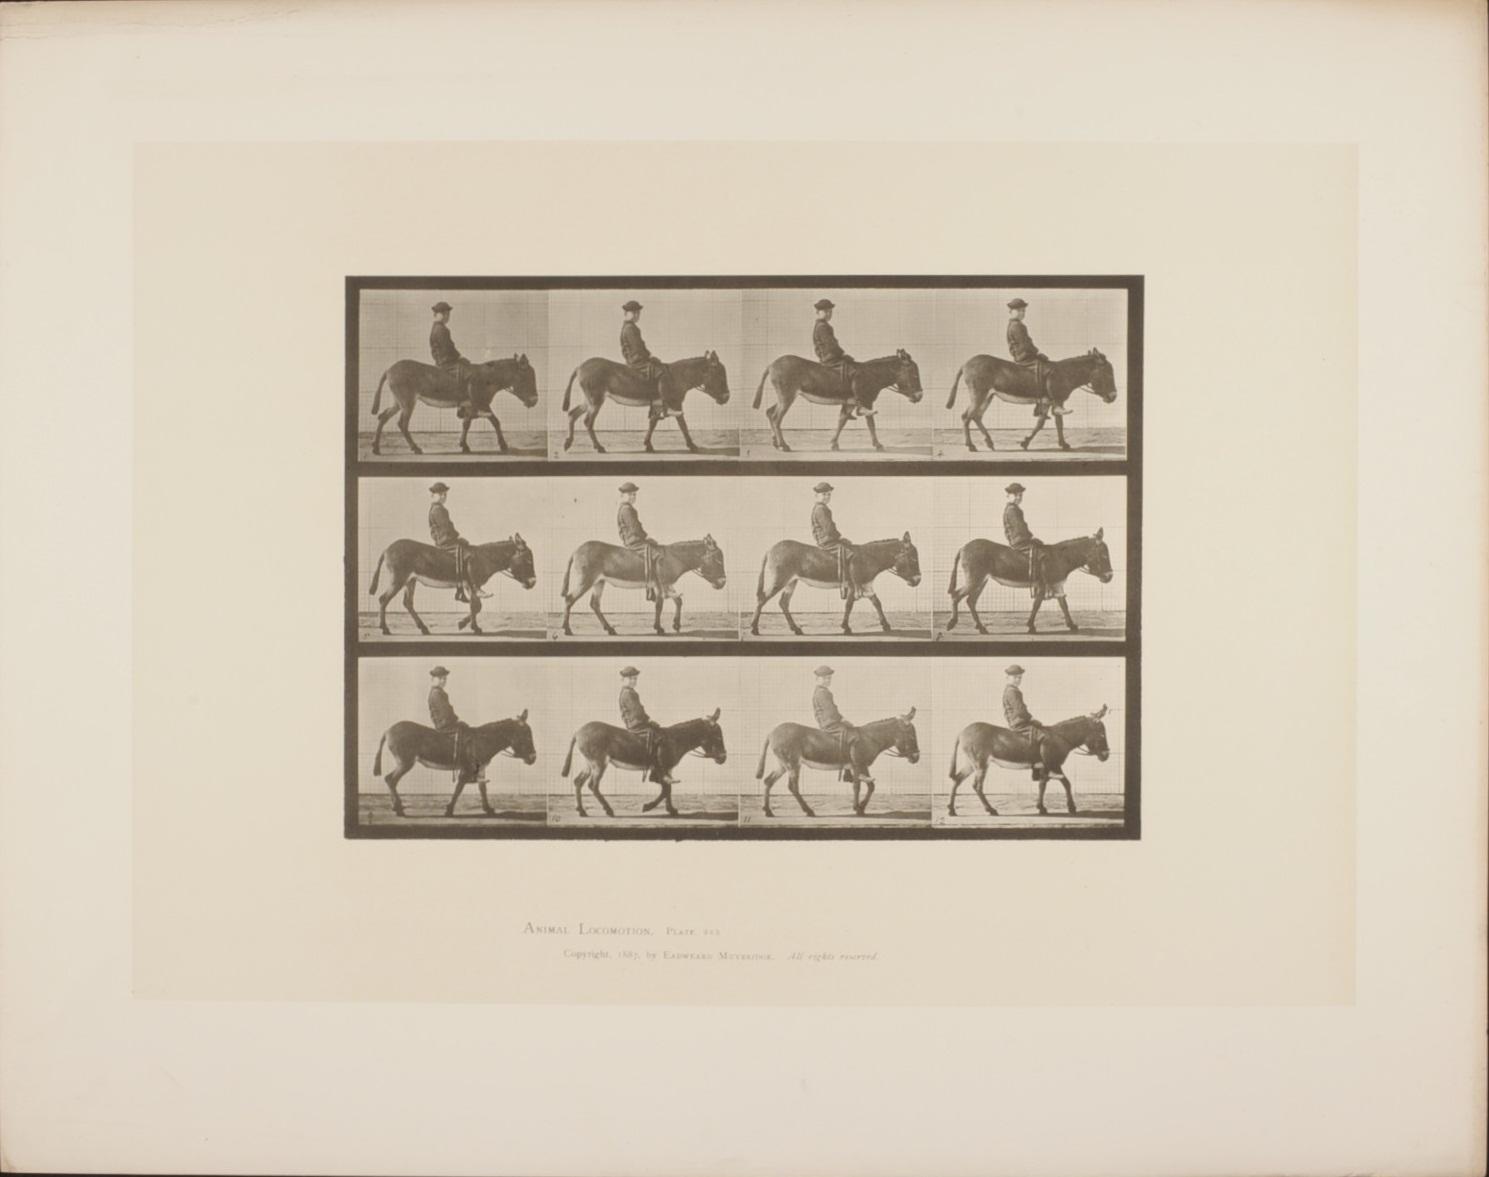 Animal locomotion, plate 655